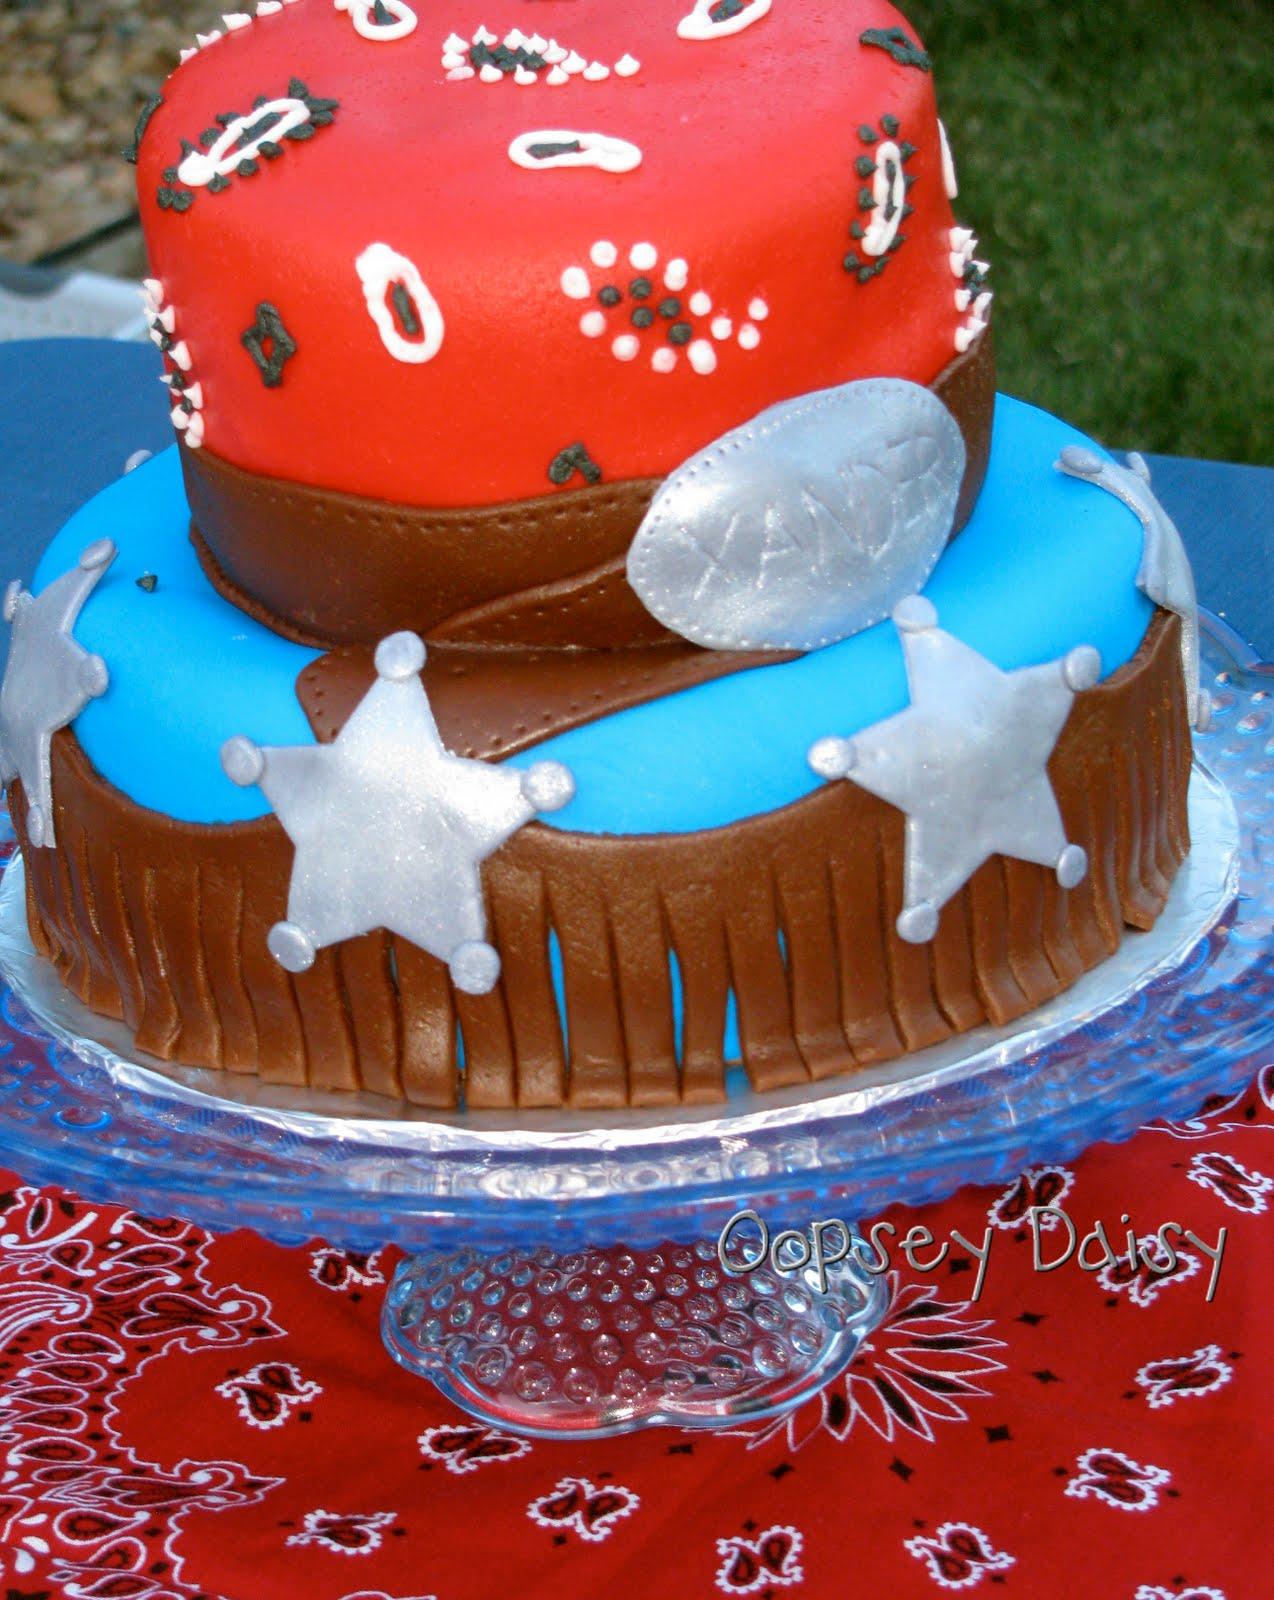 Cowboy birthday party cakes